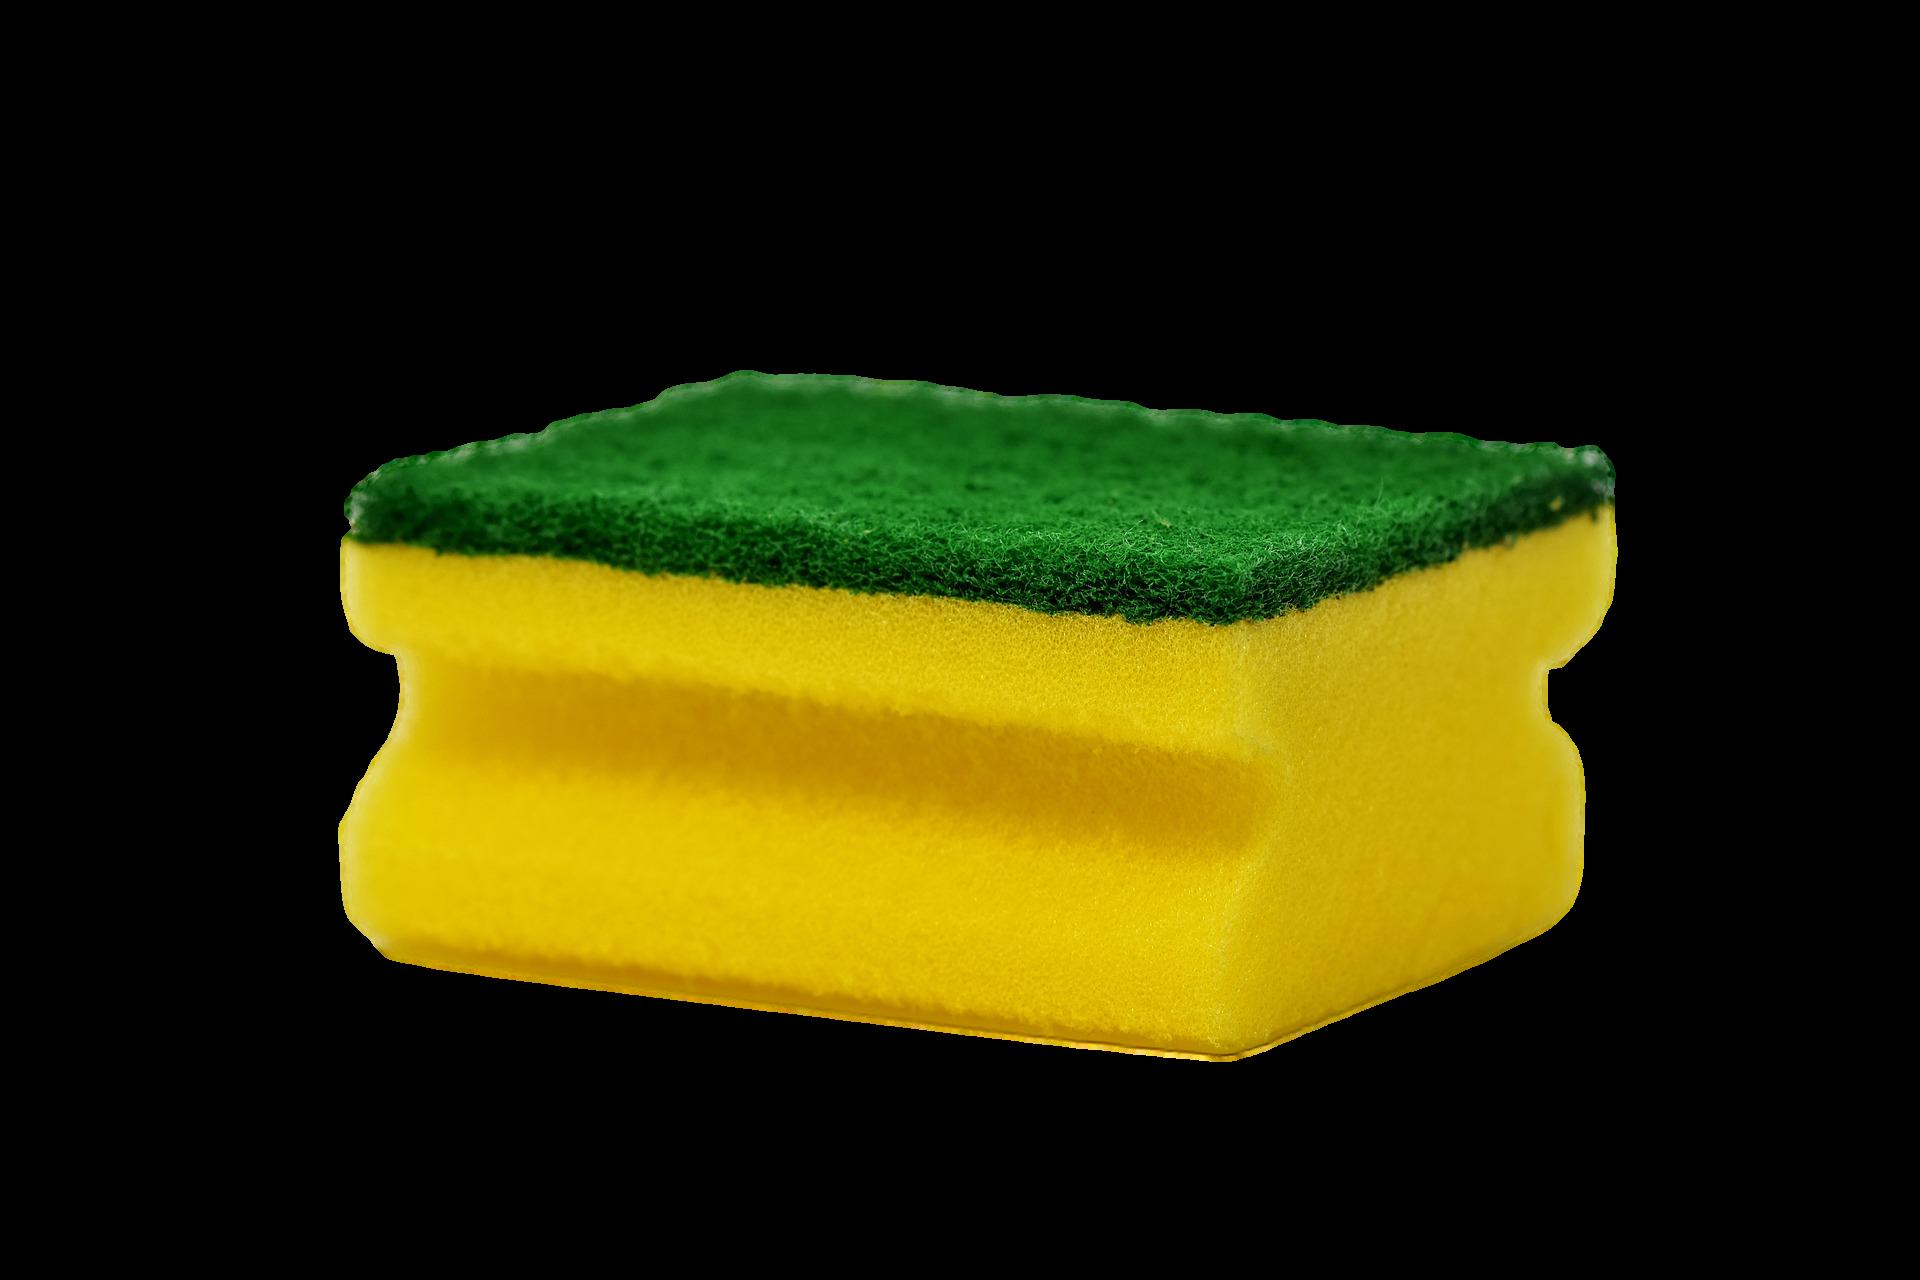 Scoruing-Sponge-Single